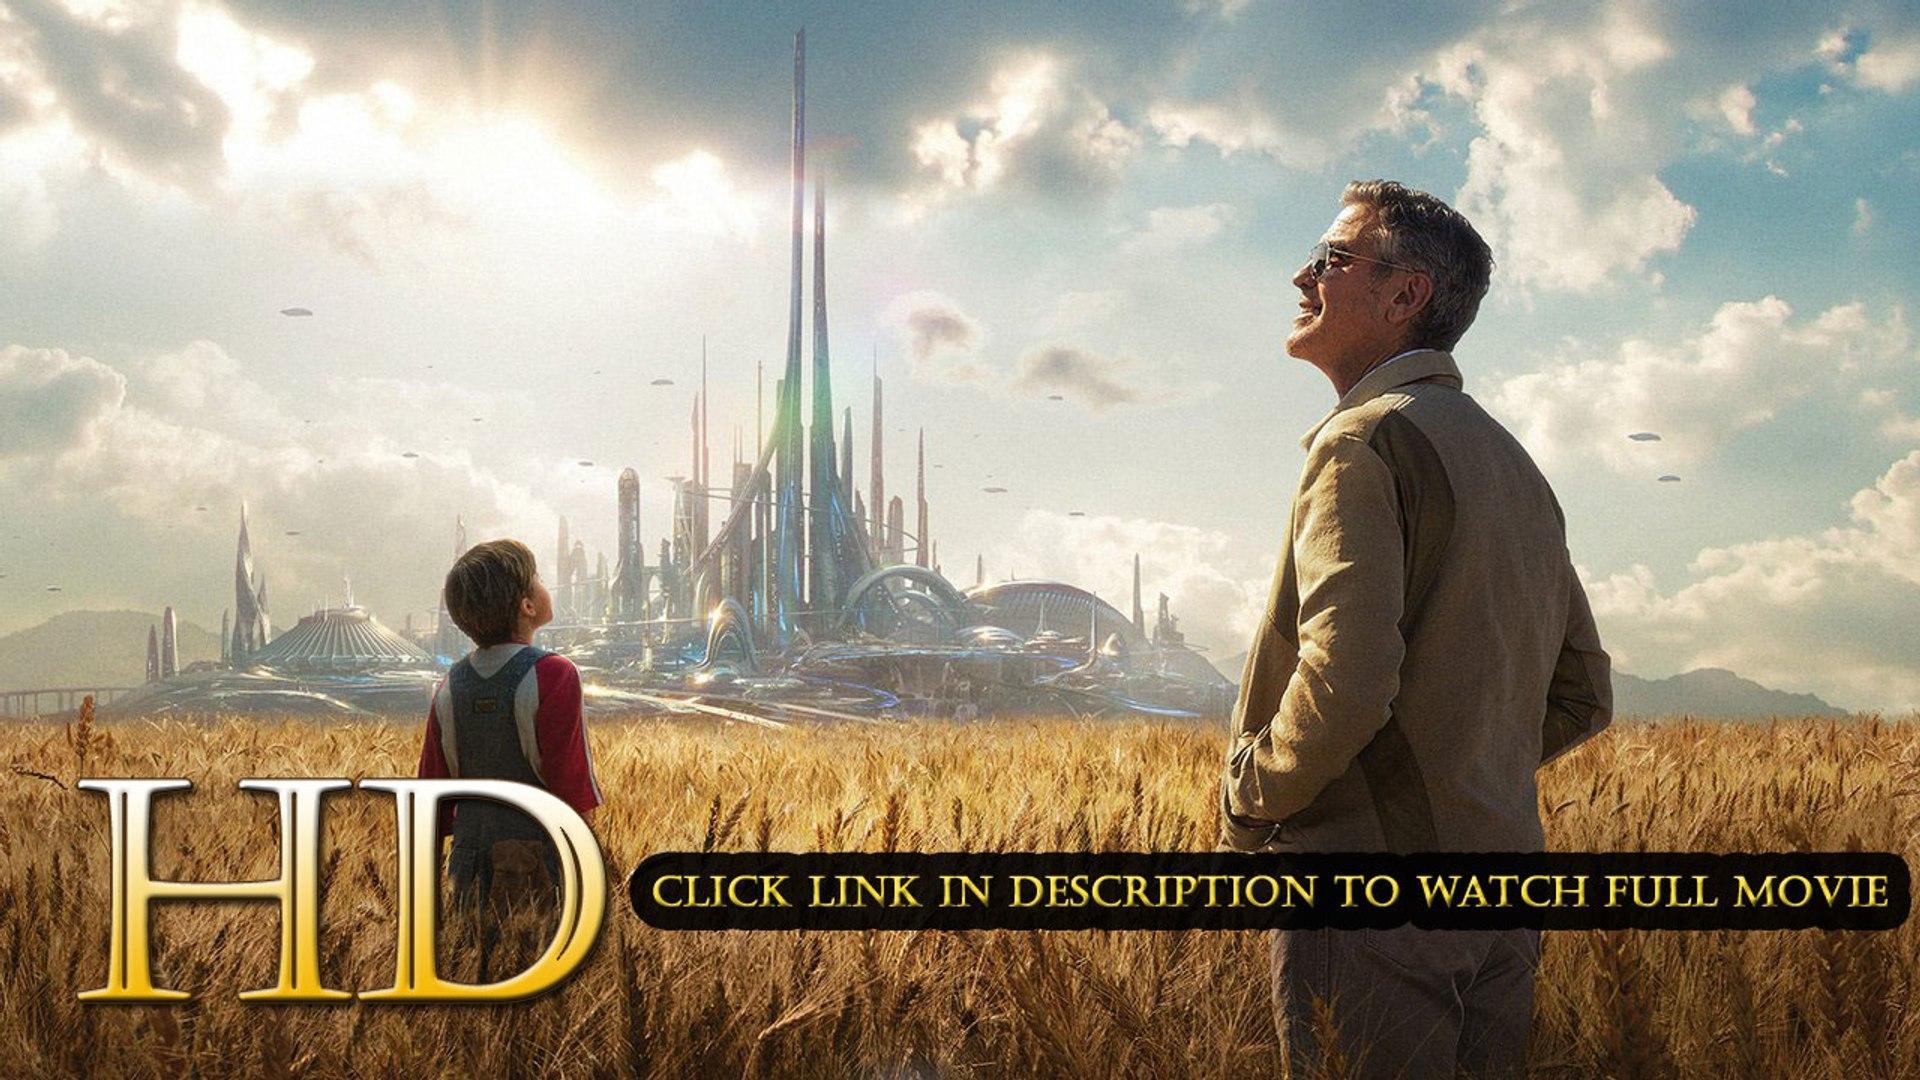 Tomorrowland 2015 Regarder film complet en français